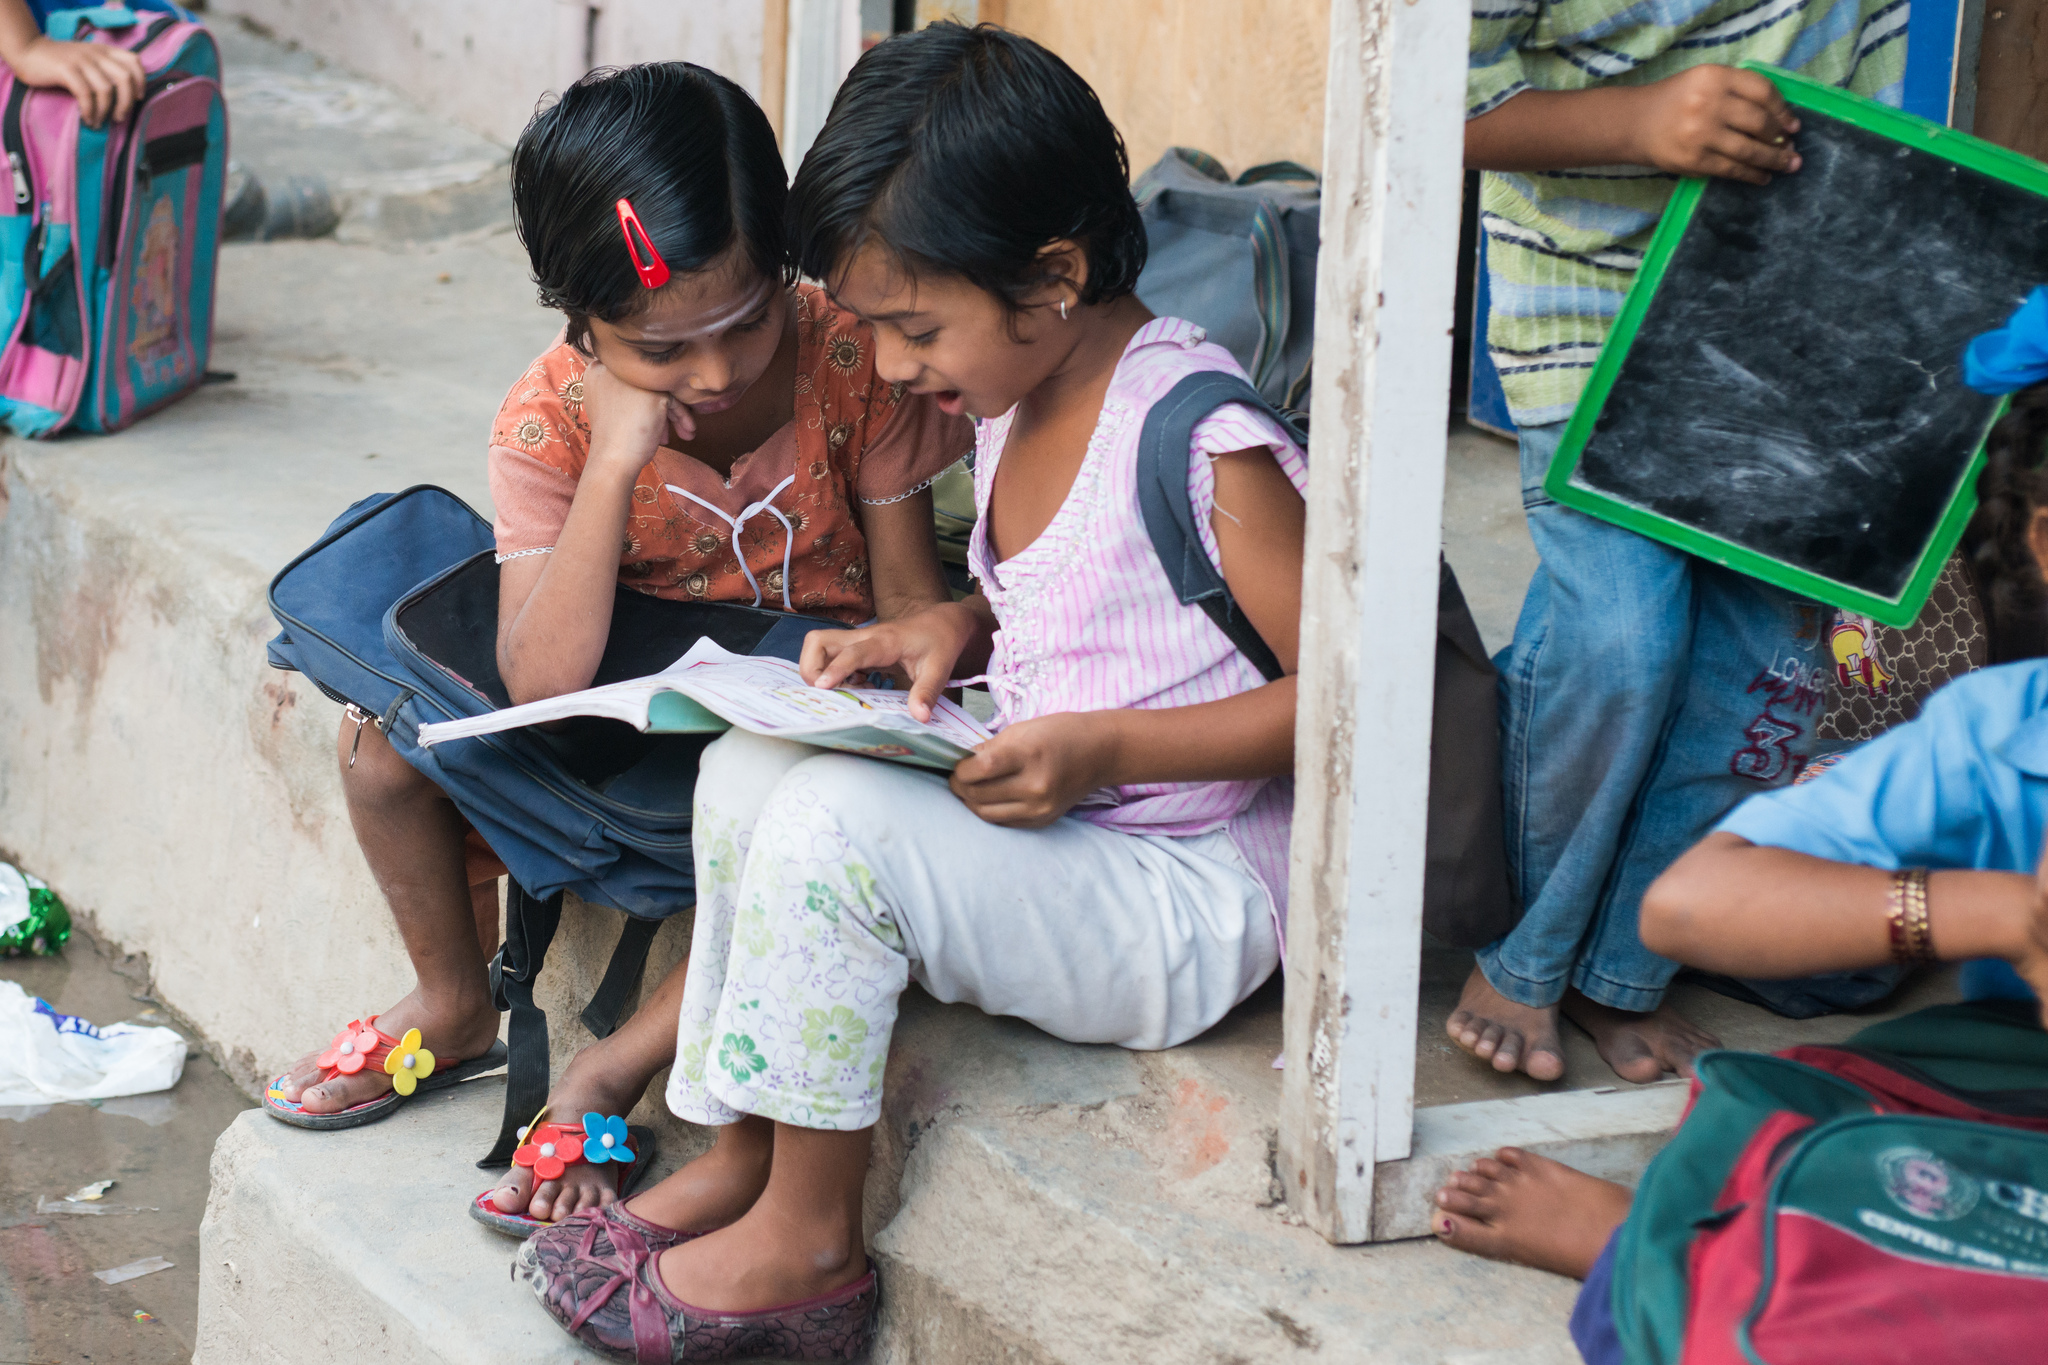 Children reading in India